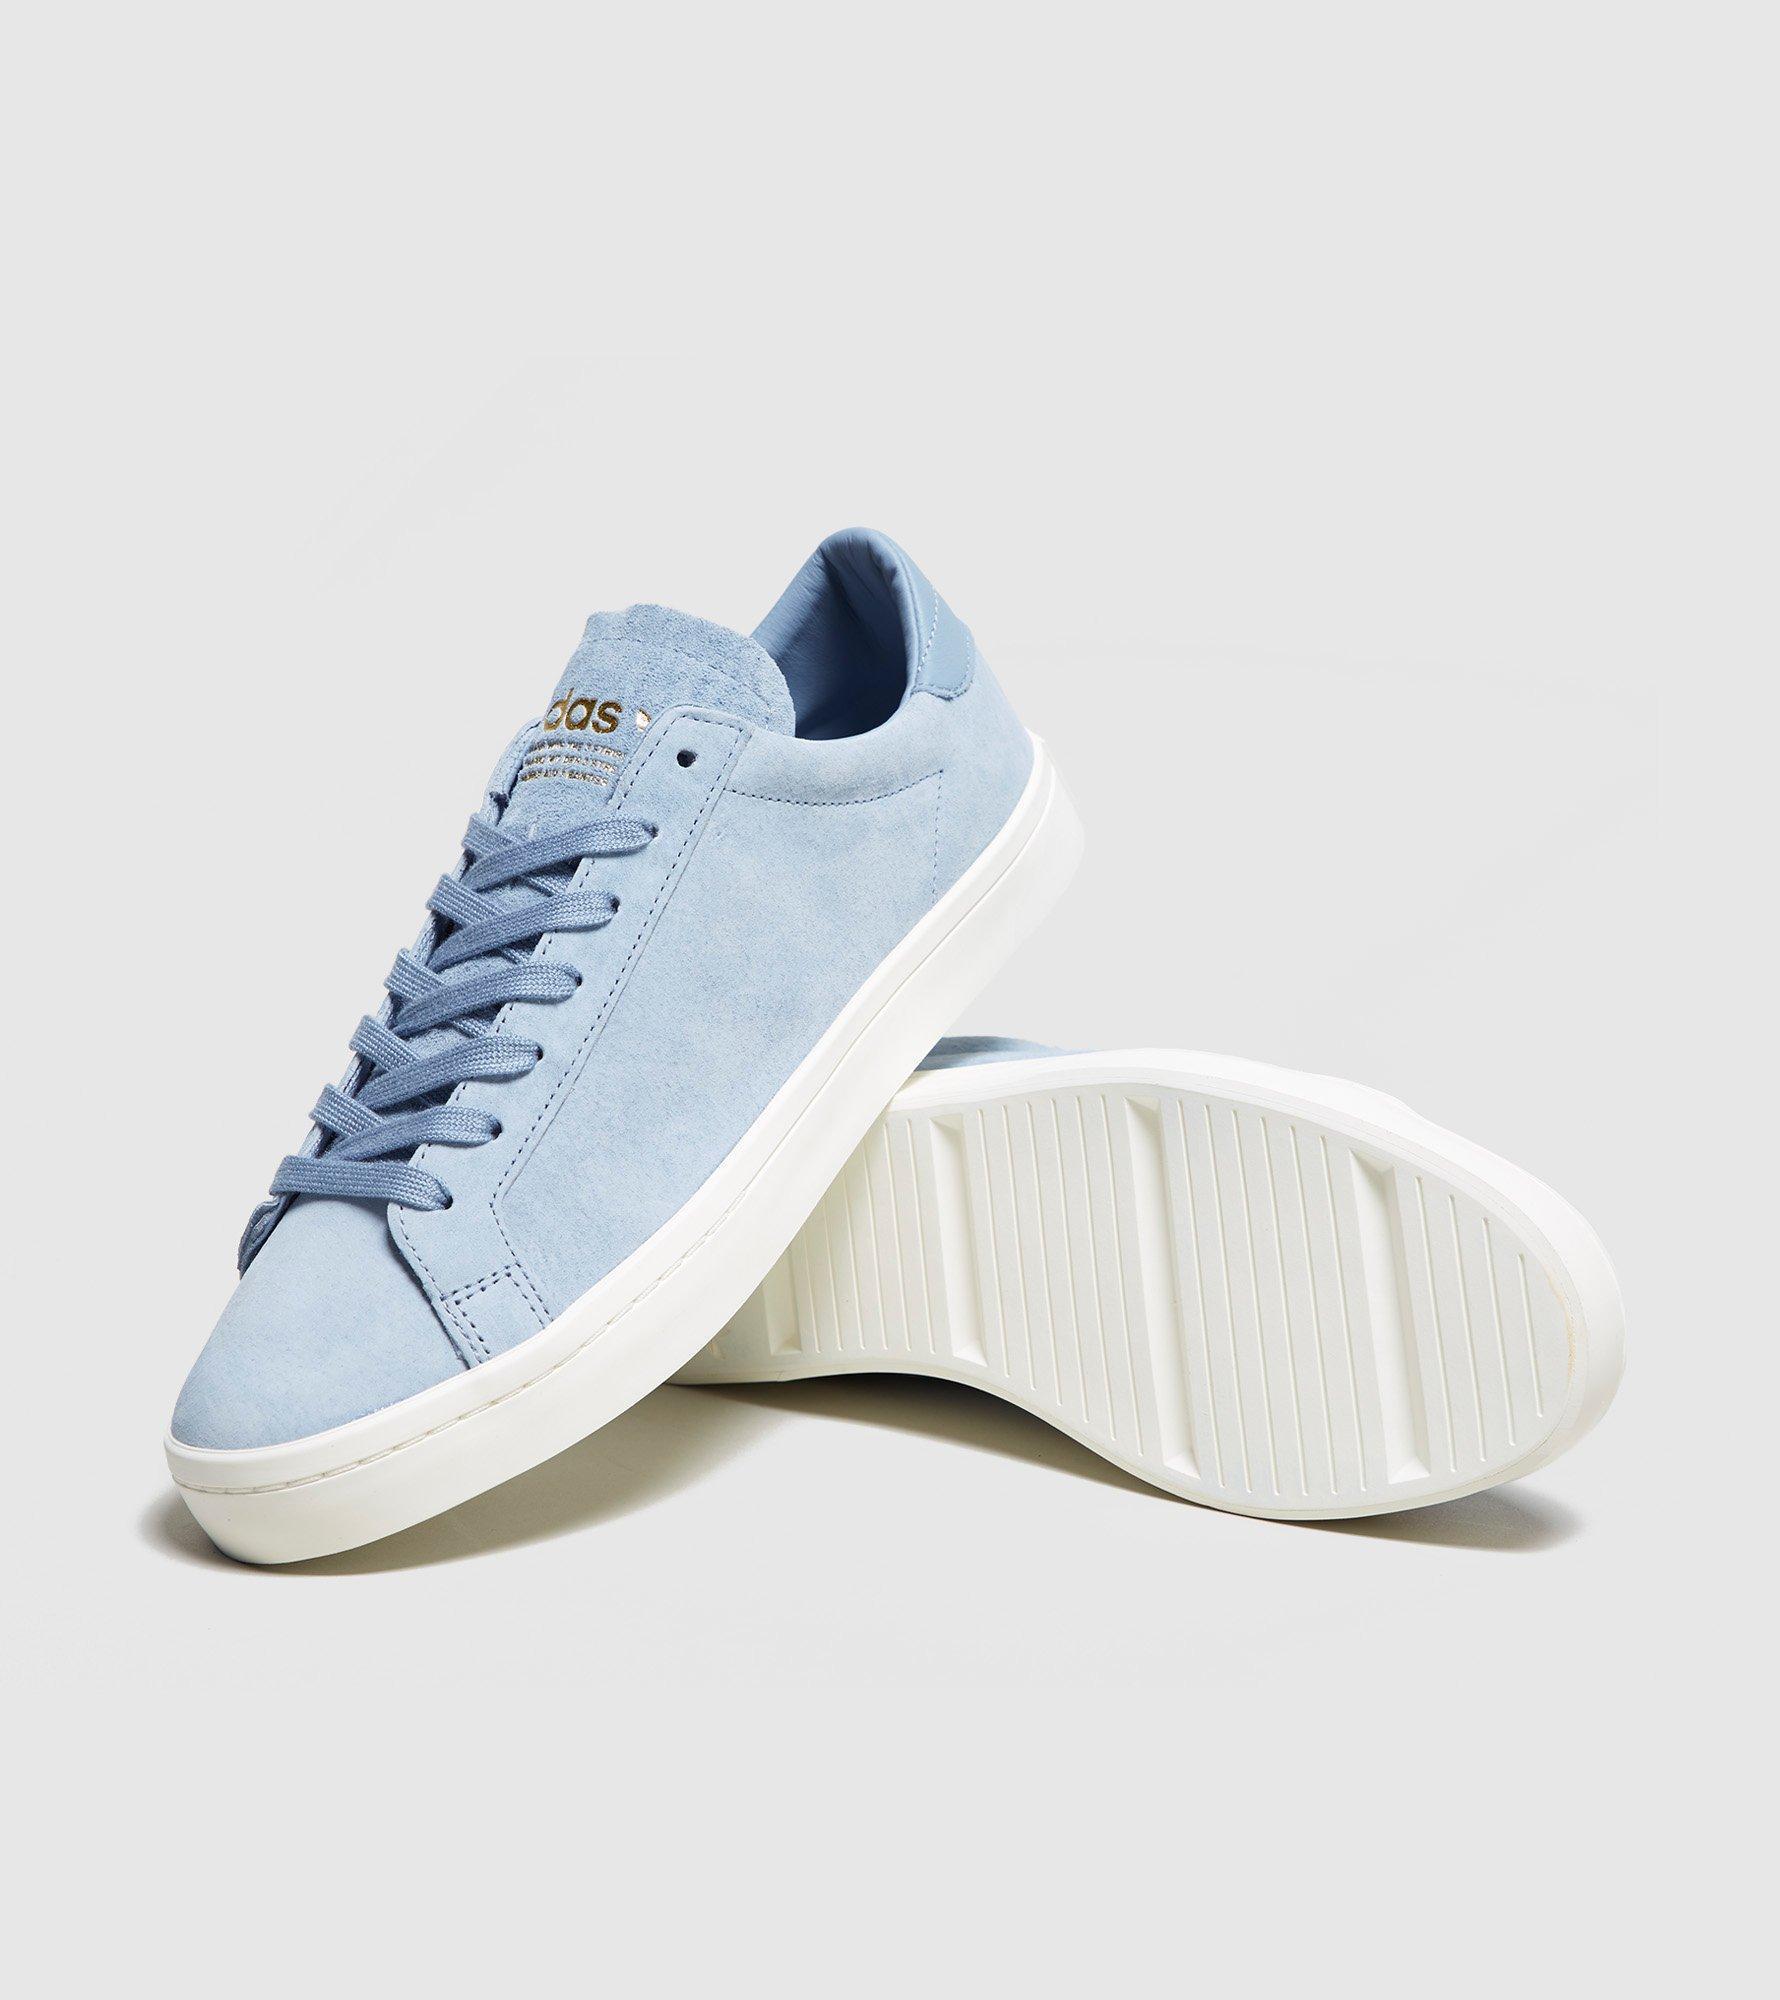 eb2bb069f97861 Adidas Originals Court Vantage in Blue for Men - Lyst